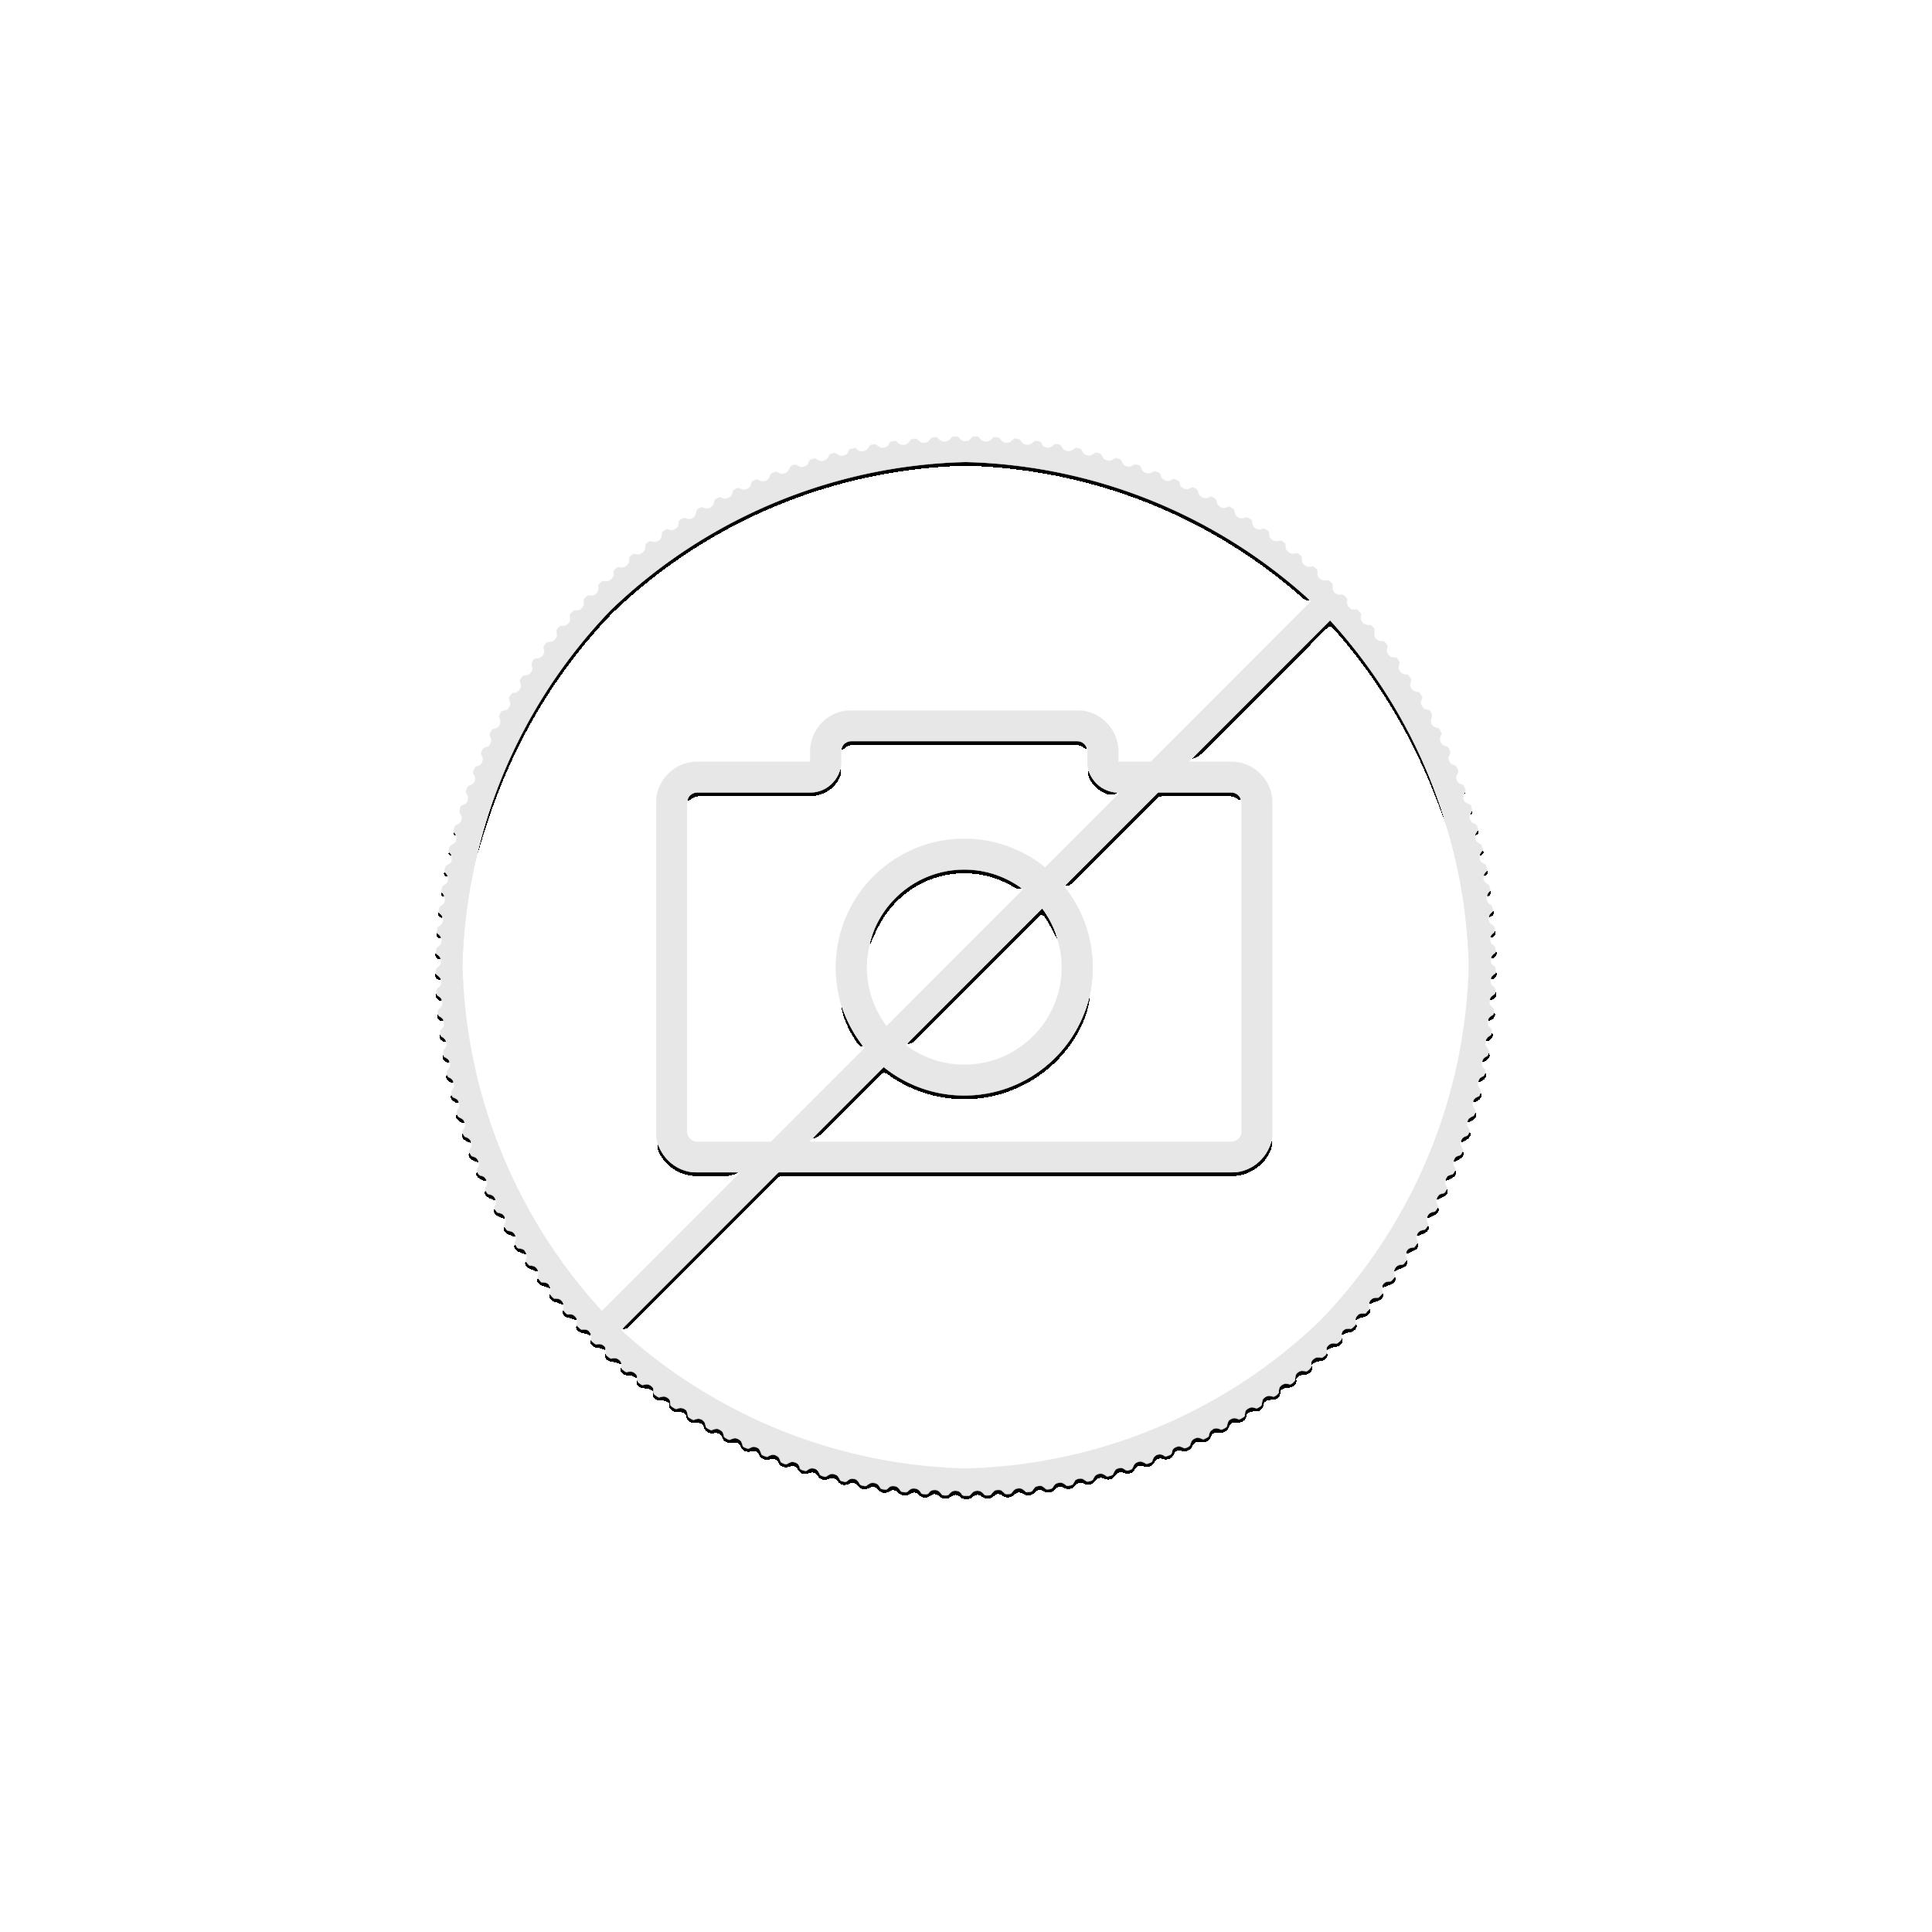 2 troy ounce zilveren munt Qi Lin Unicorn antieke afwerking 2018